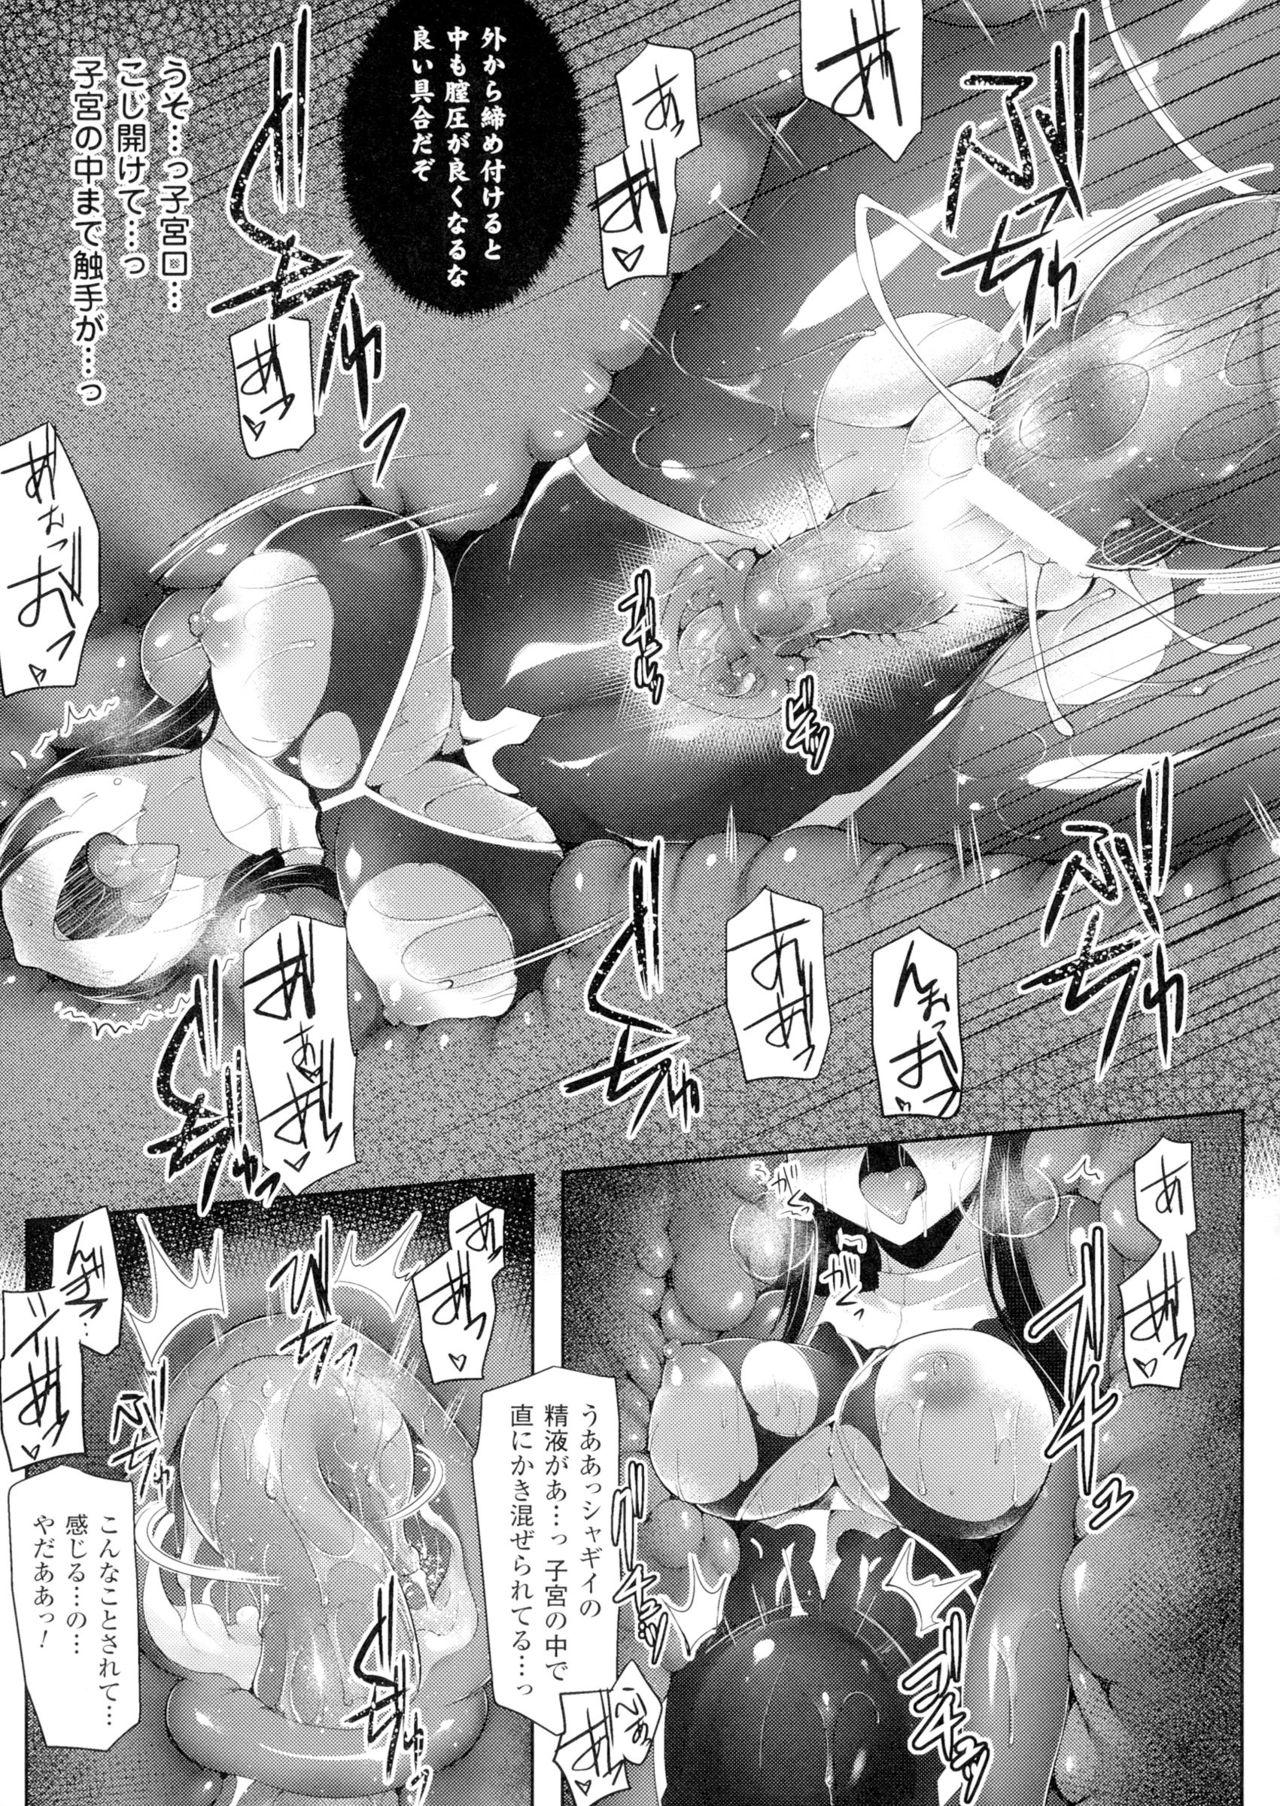 Seigi no Heroine Kangoku File DX Vol. 1 106